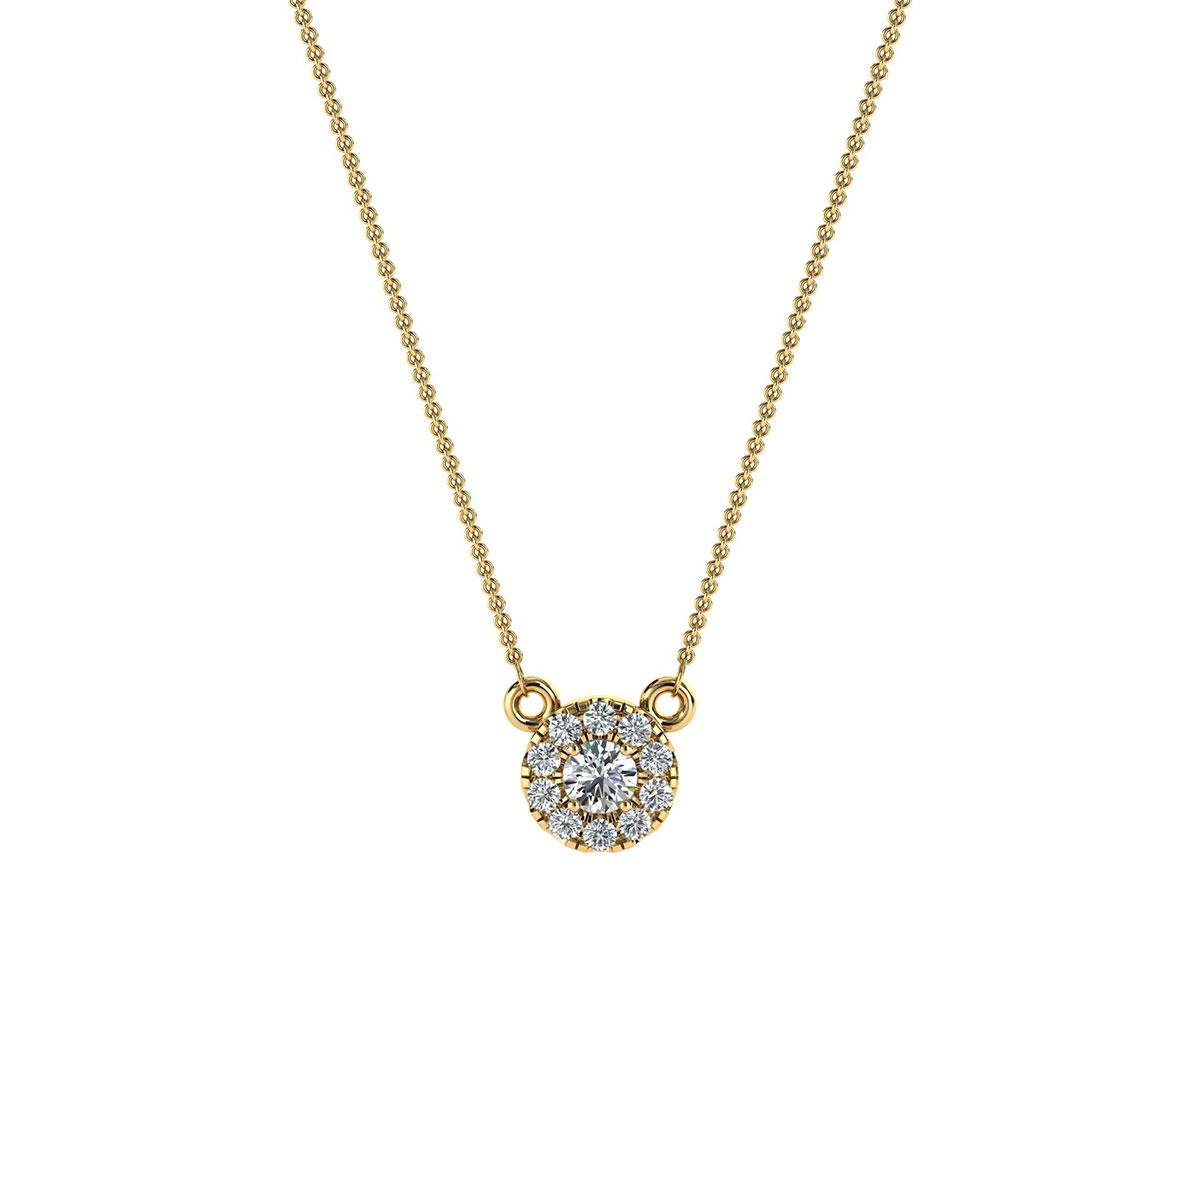 14K Yellow Gold Petite Halo Diamond Pendant ( 0.10 ct. tw)